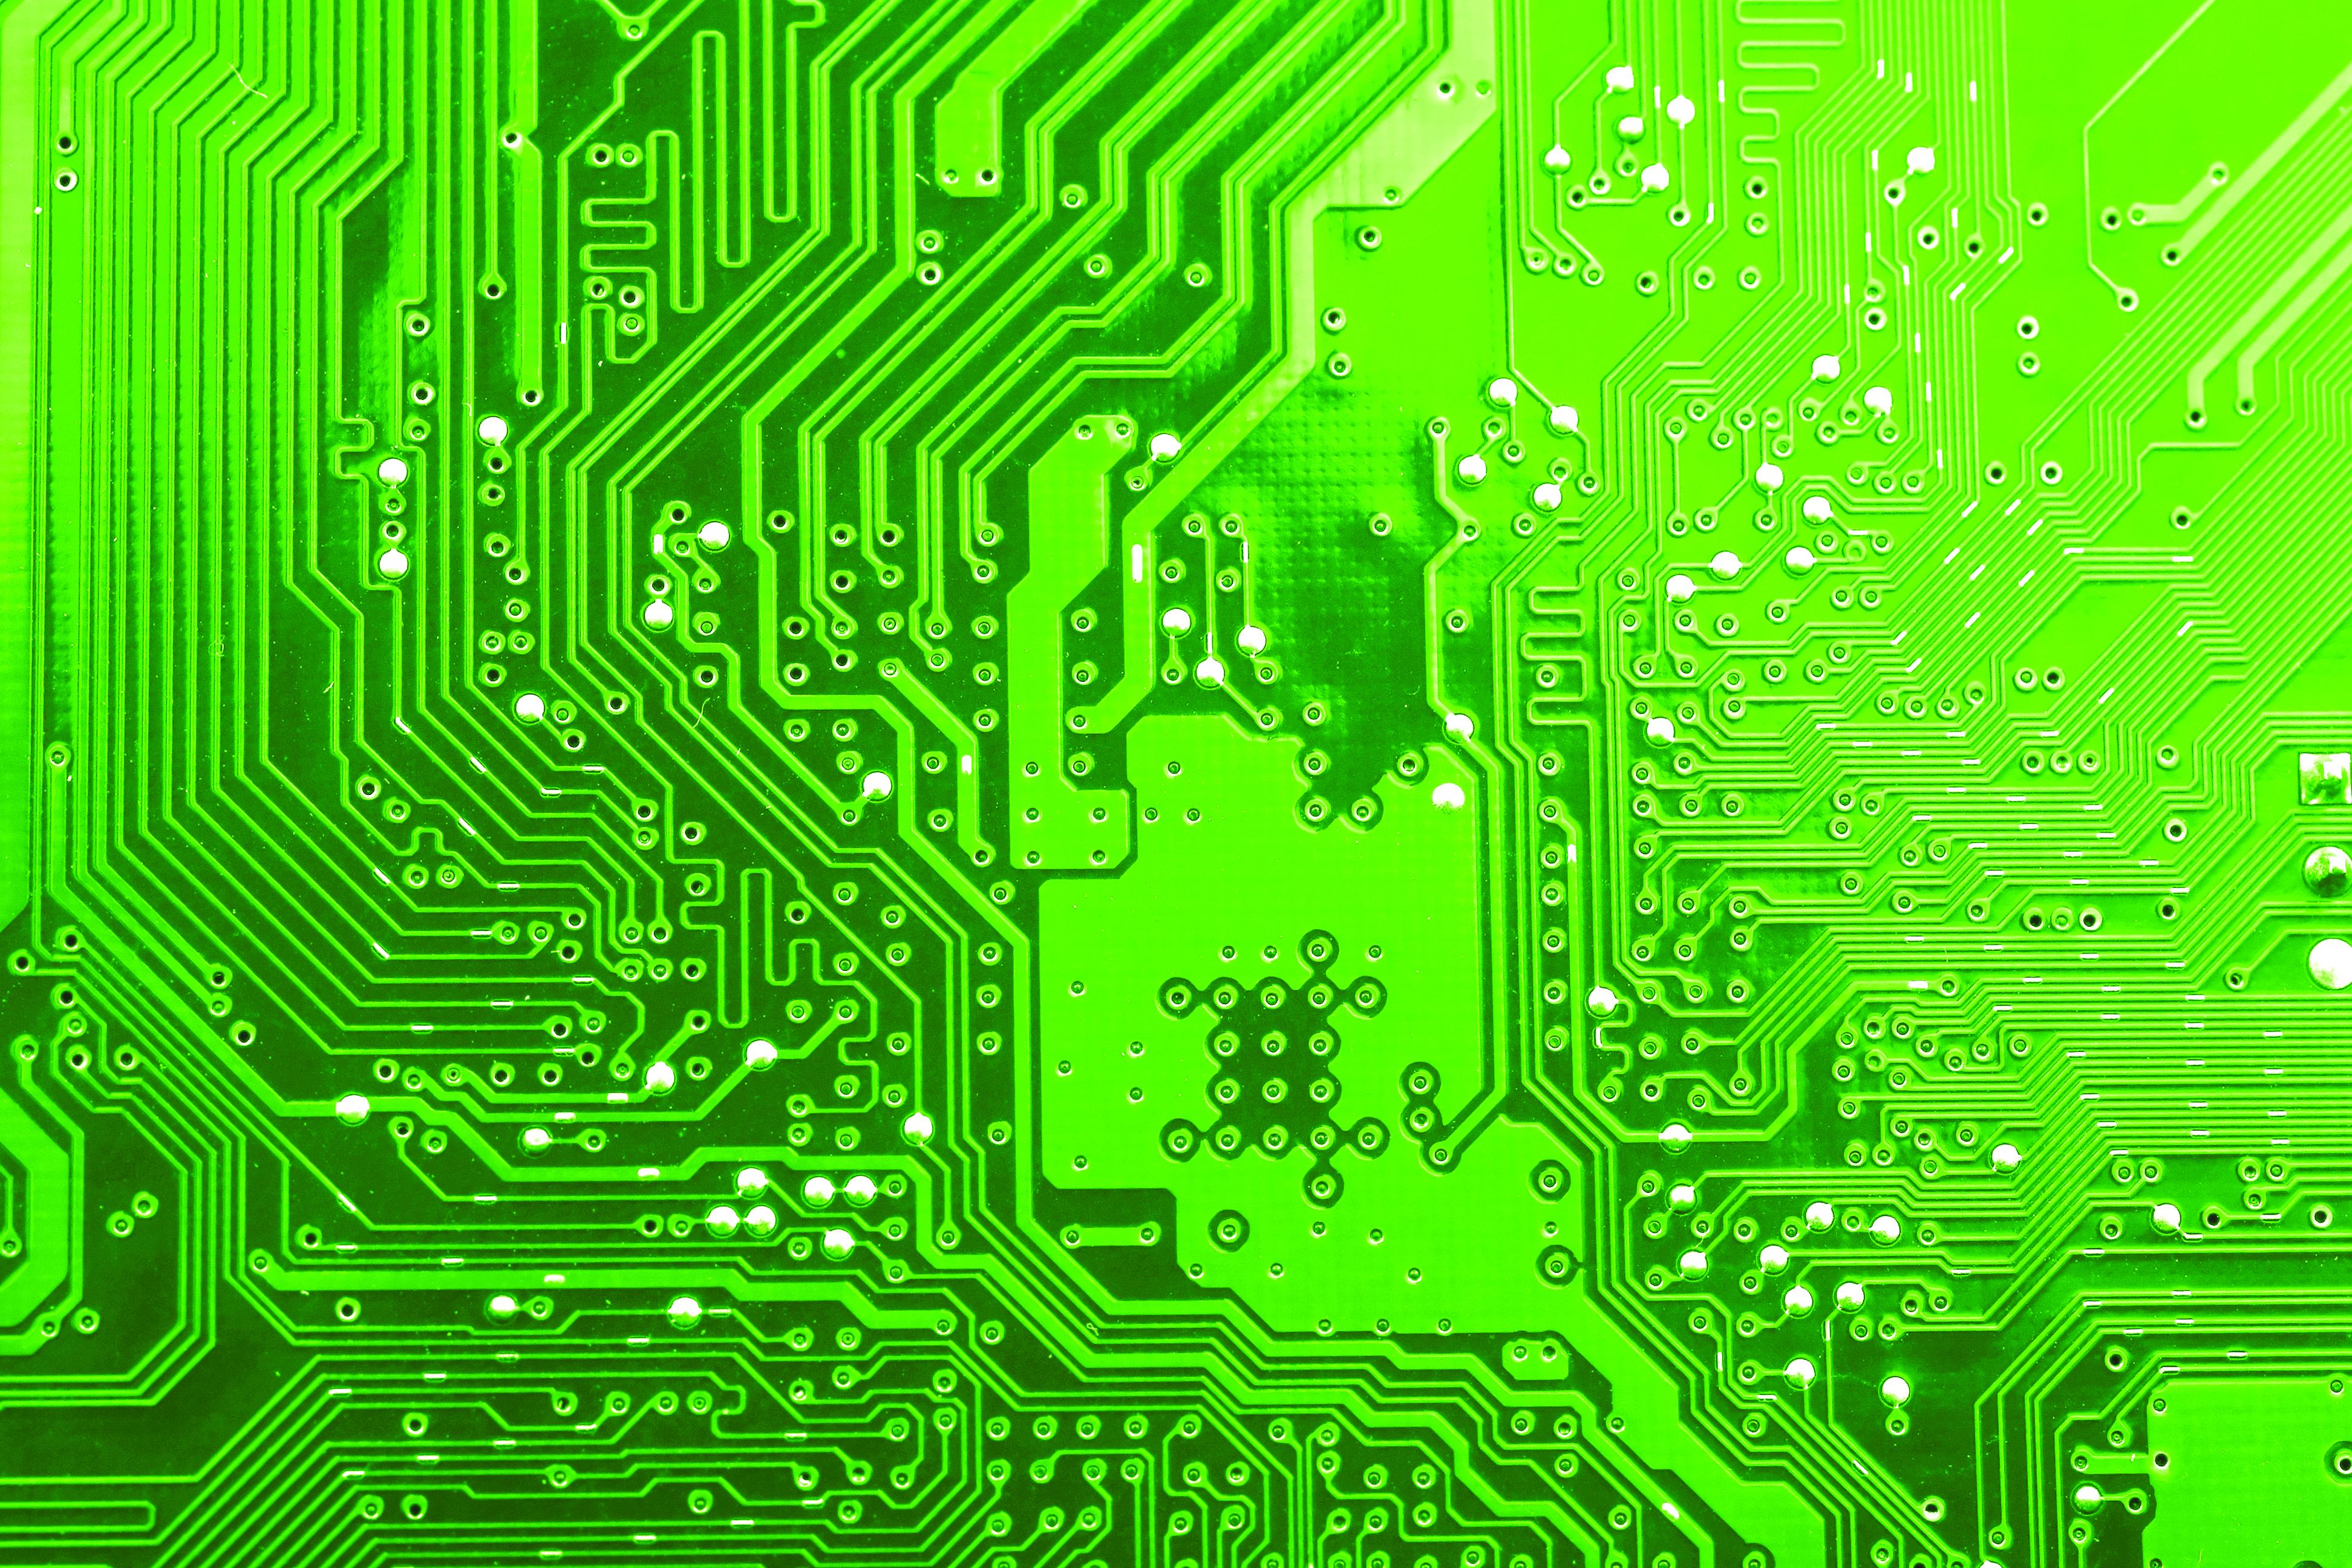 Computer Chip Computer chipjpg 3888x2592